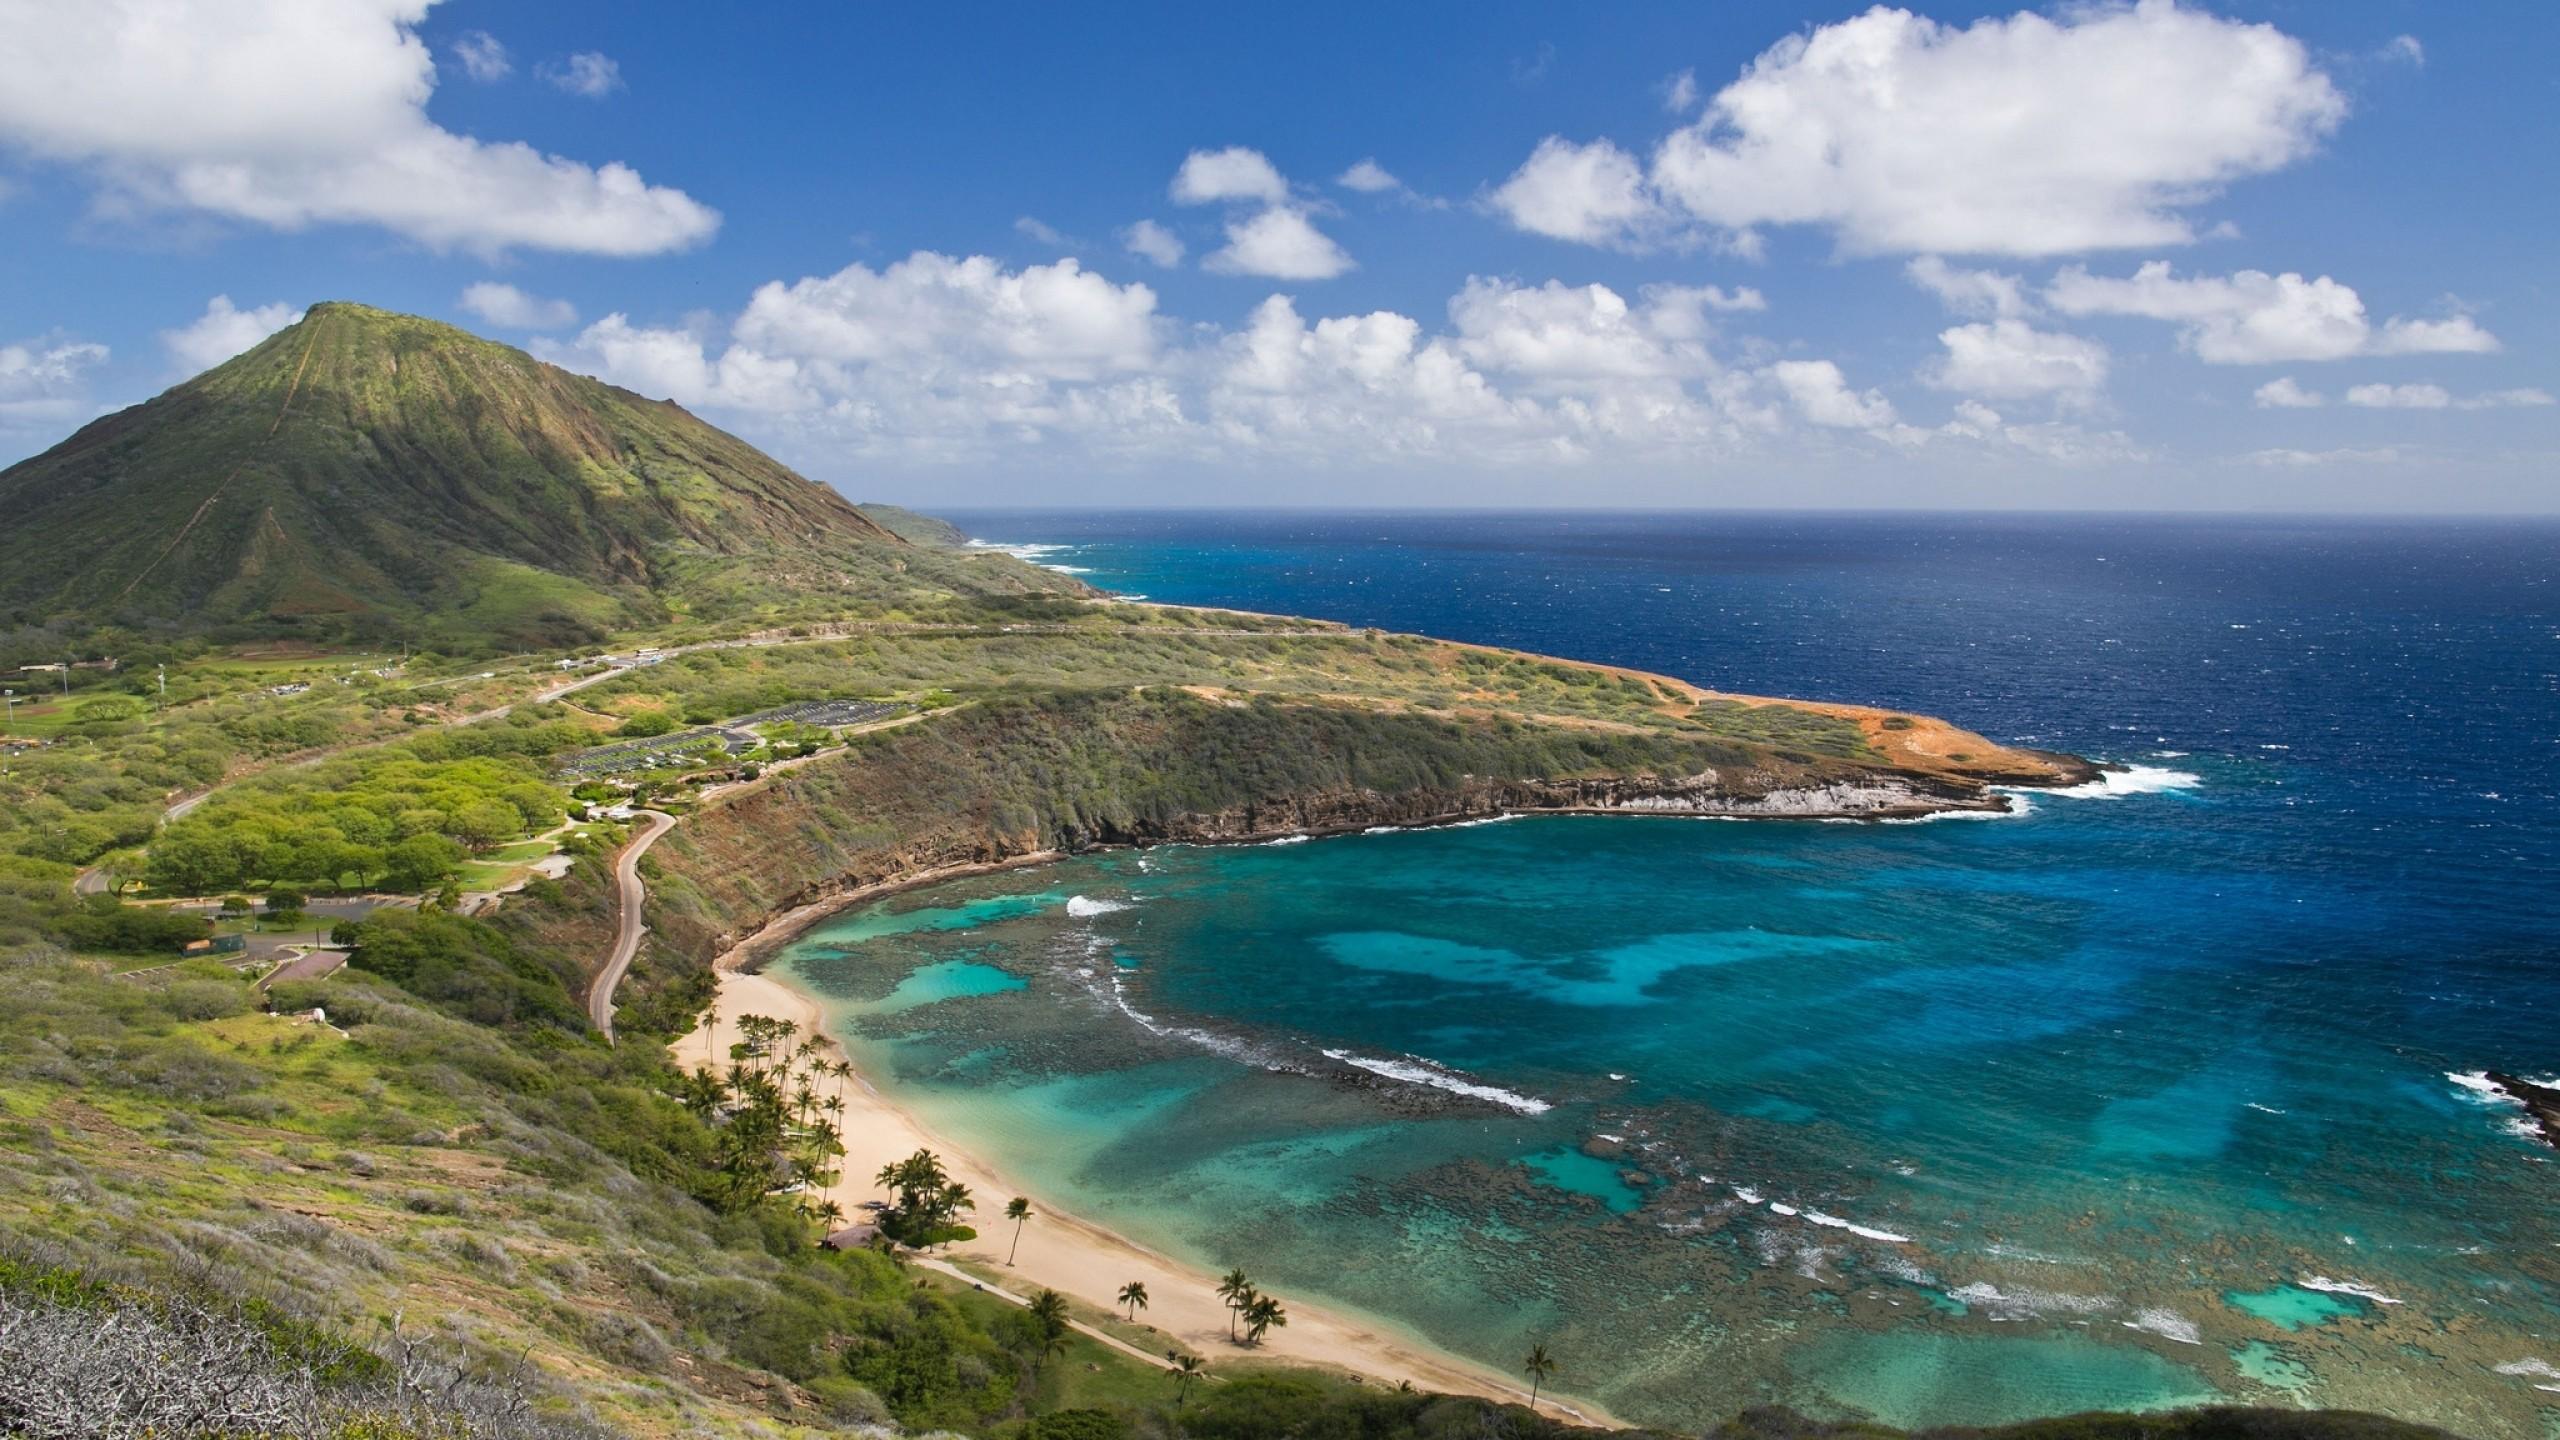 Preview wallpaper hanauma bay, oahu island, hawai, oahu, hawaii, mountain,